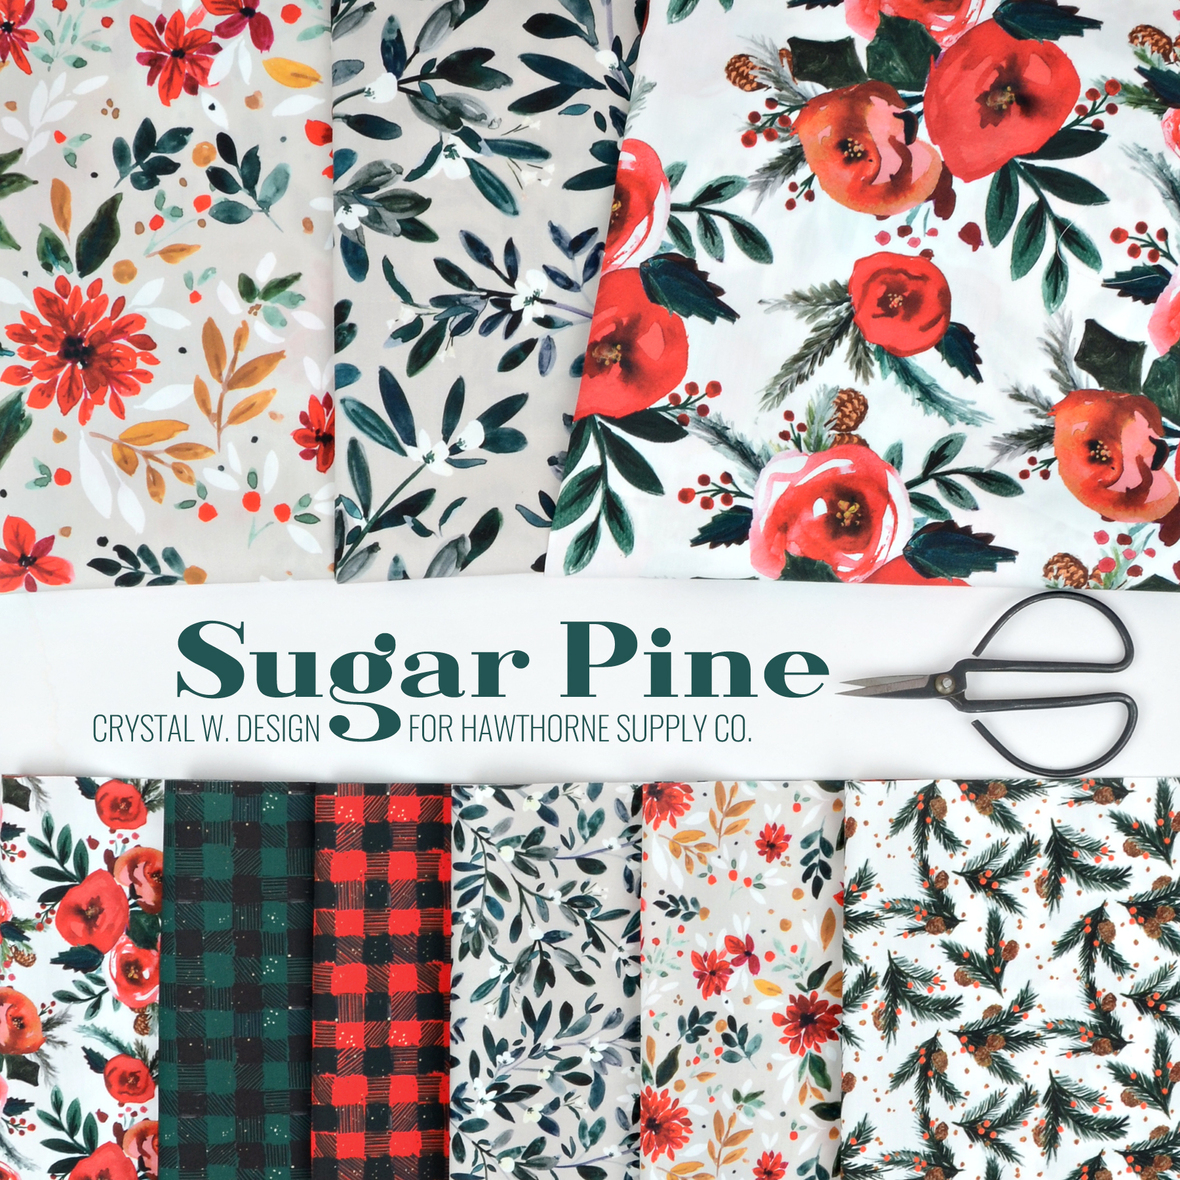 Sugar Pine Christmas fabric Crystal Walen for Hawthorne Supply Co.